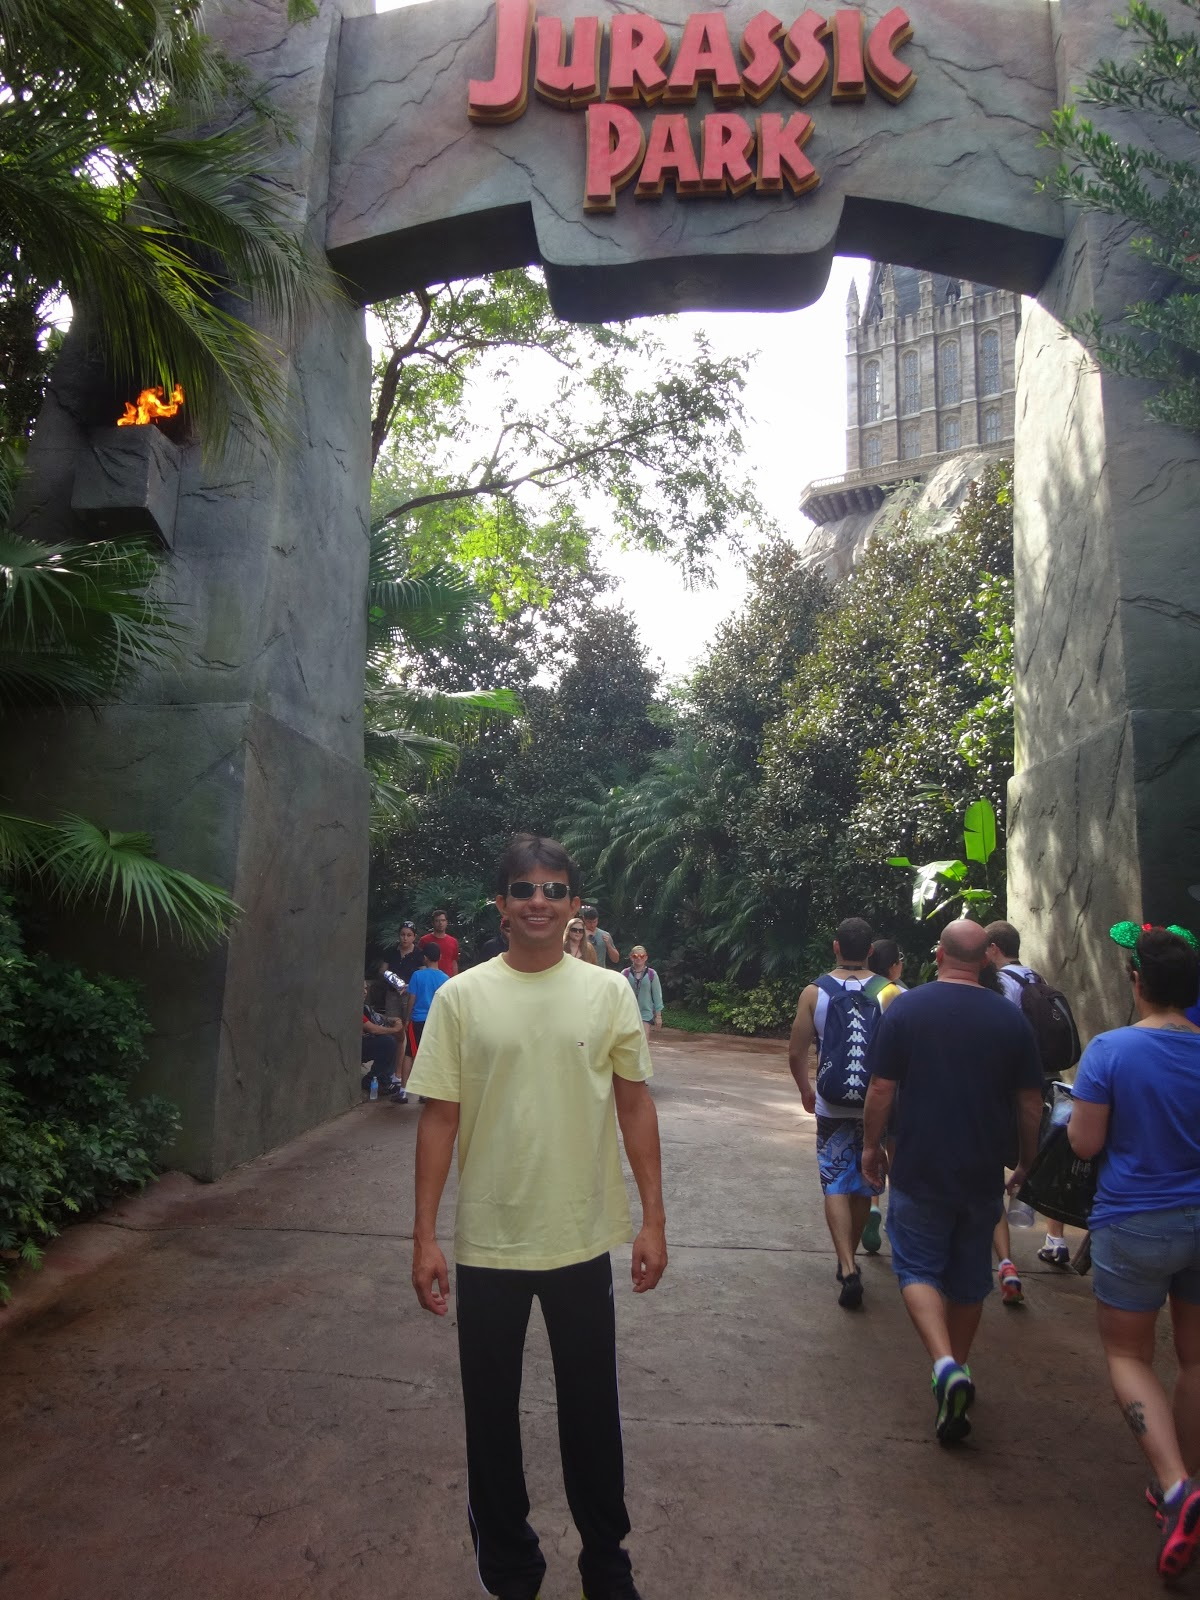 jurassic park - island of adventure - orlando, estados unidos